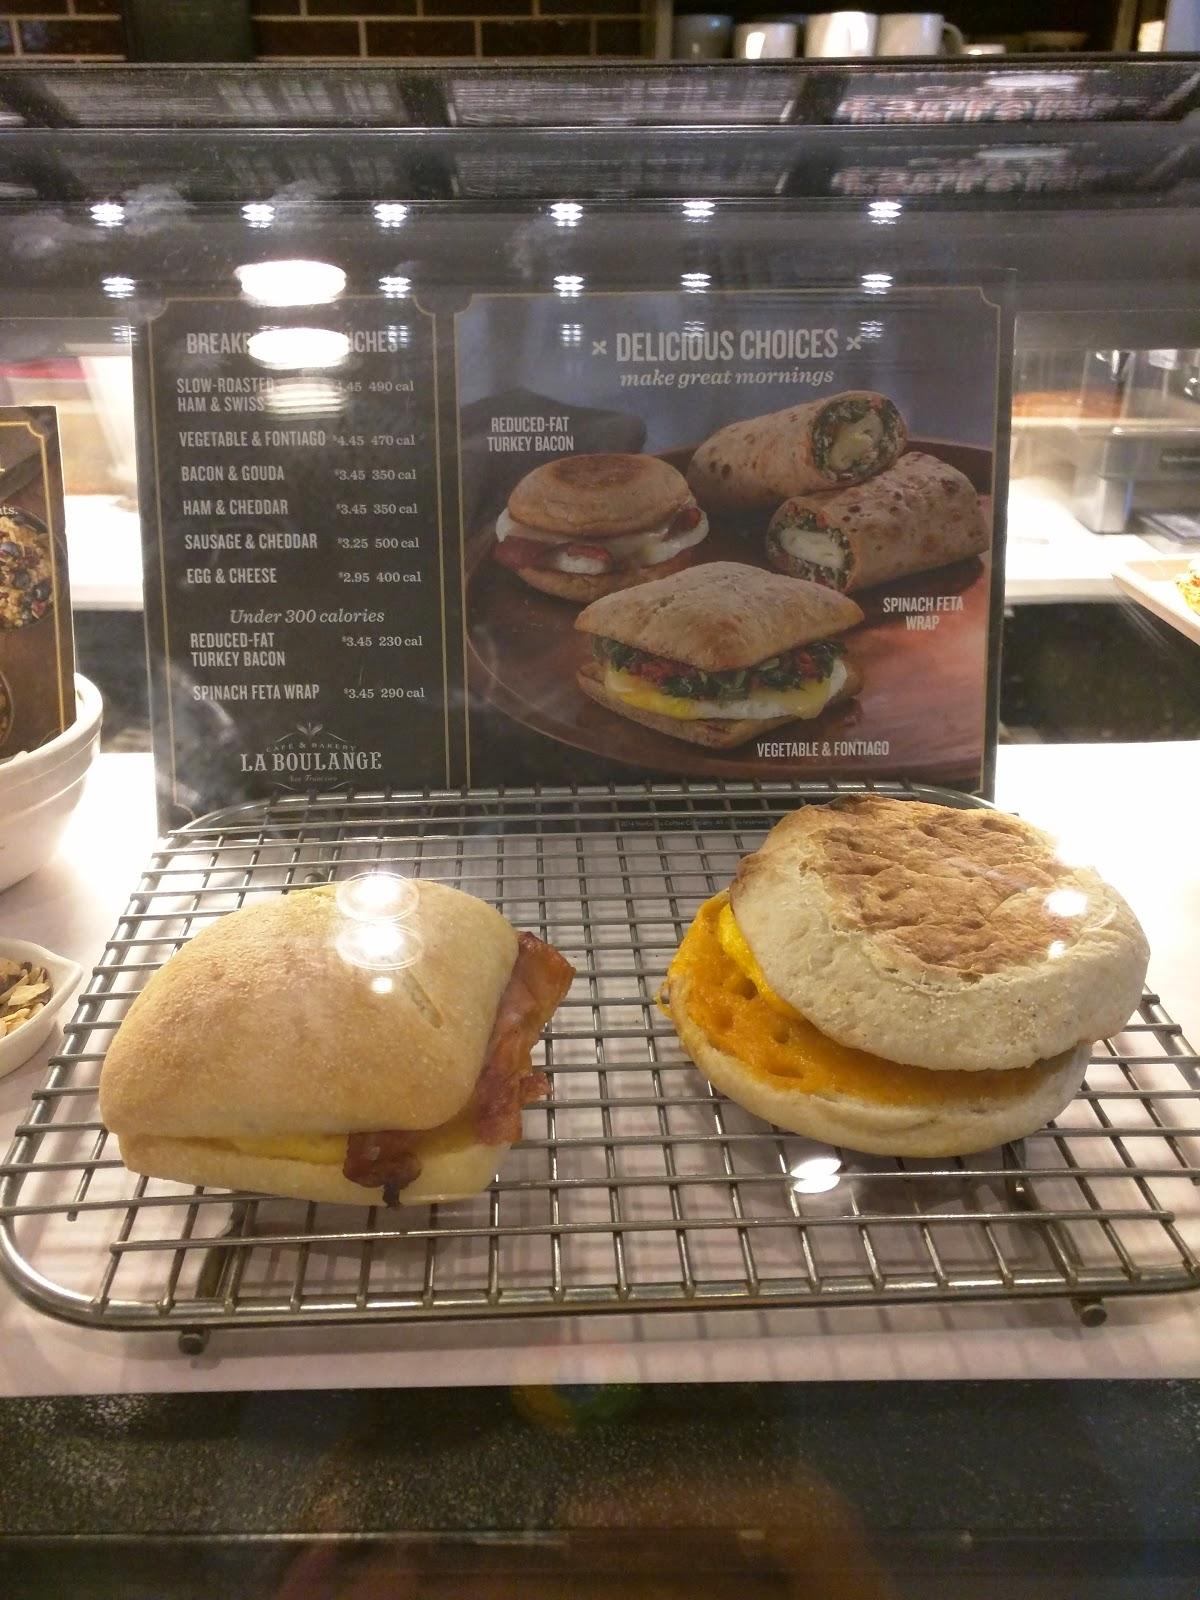 Starbucks Sausage Egg And Cheese Calories : starbucks, sausage, cheese, calories, Julie's, Dining, Club:, Starbucks, Sandwiches